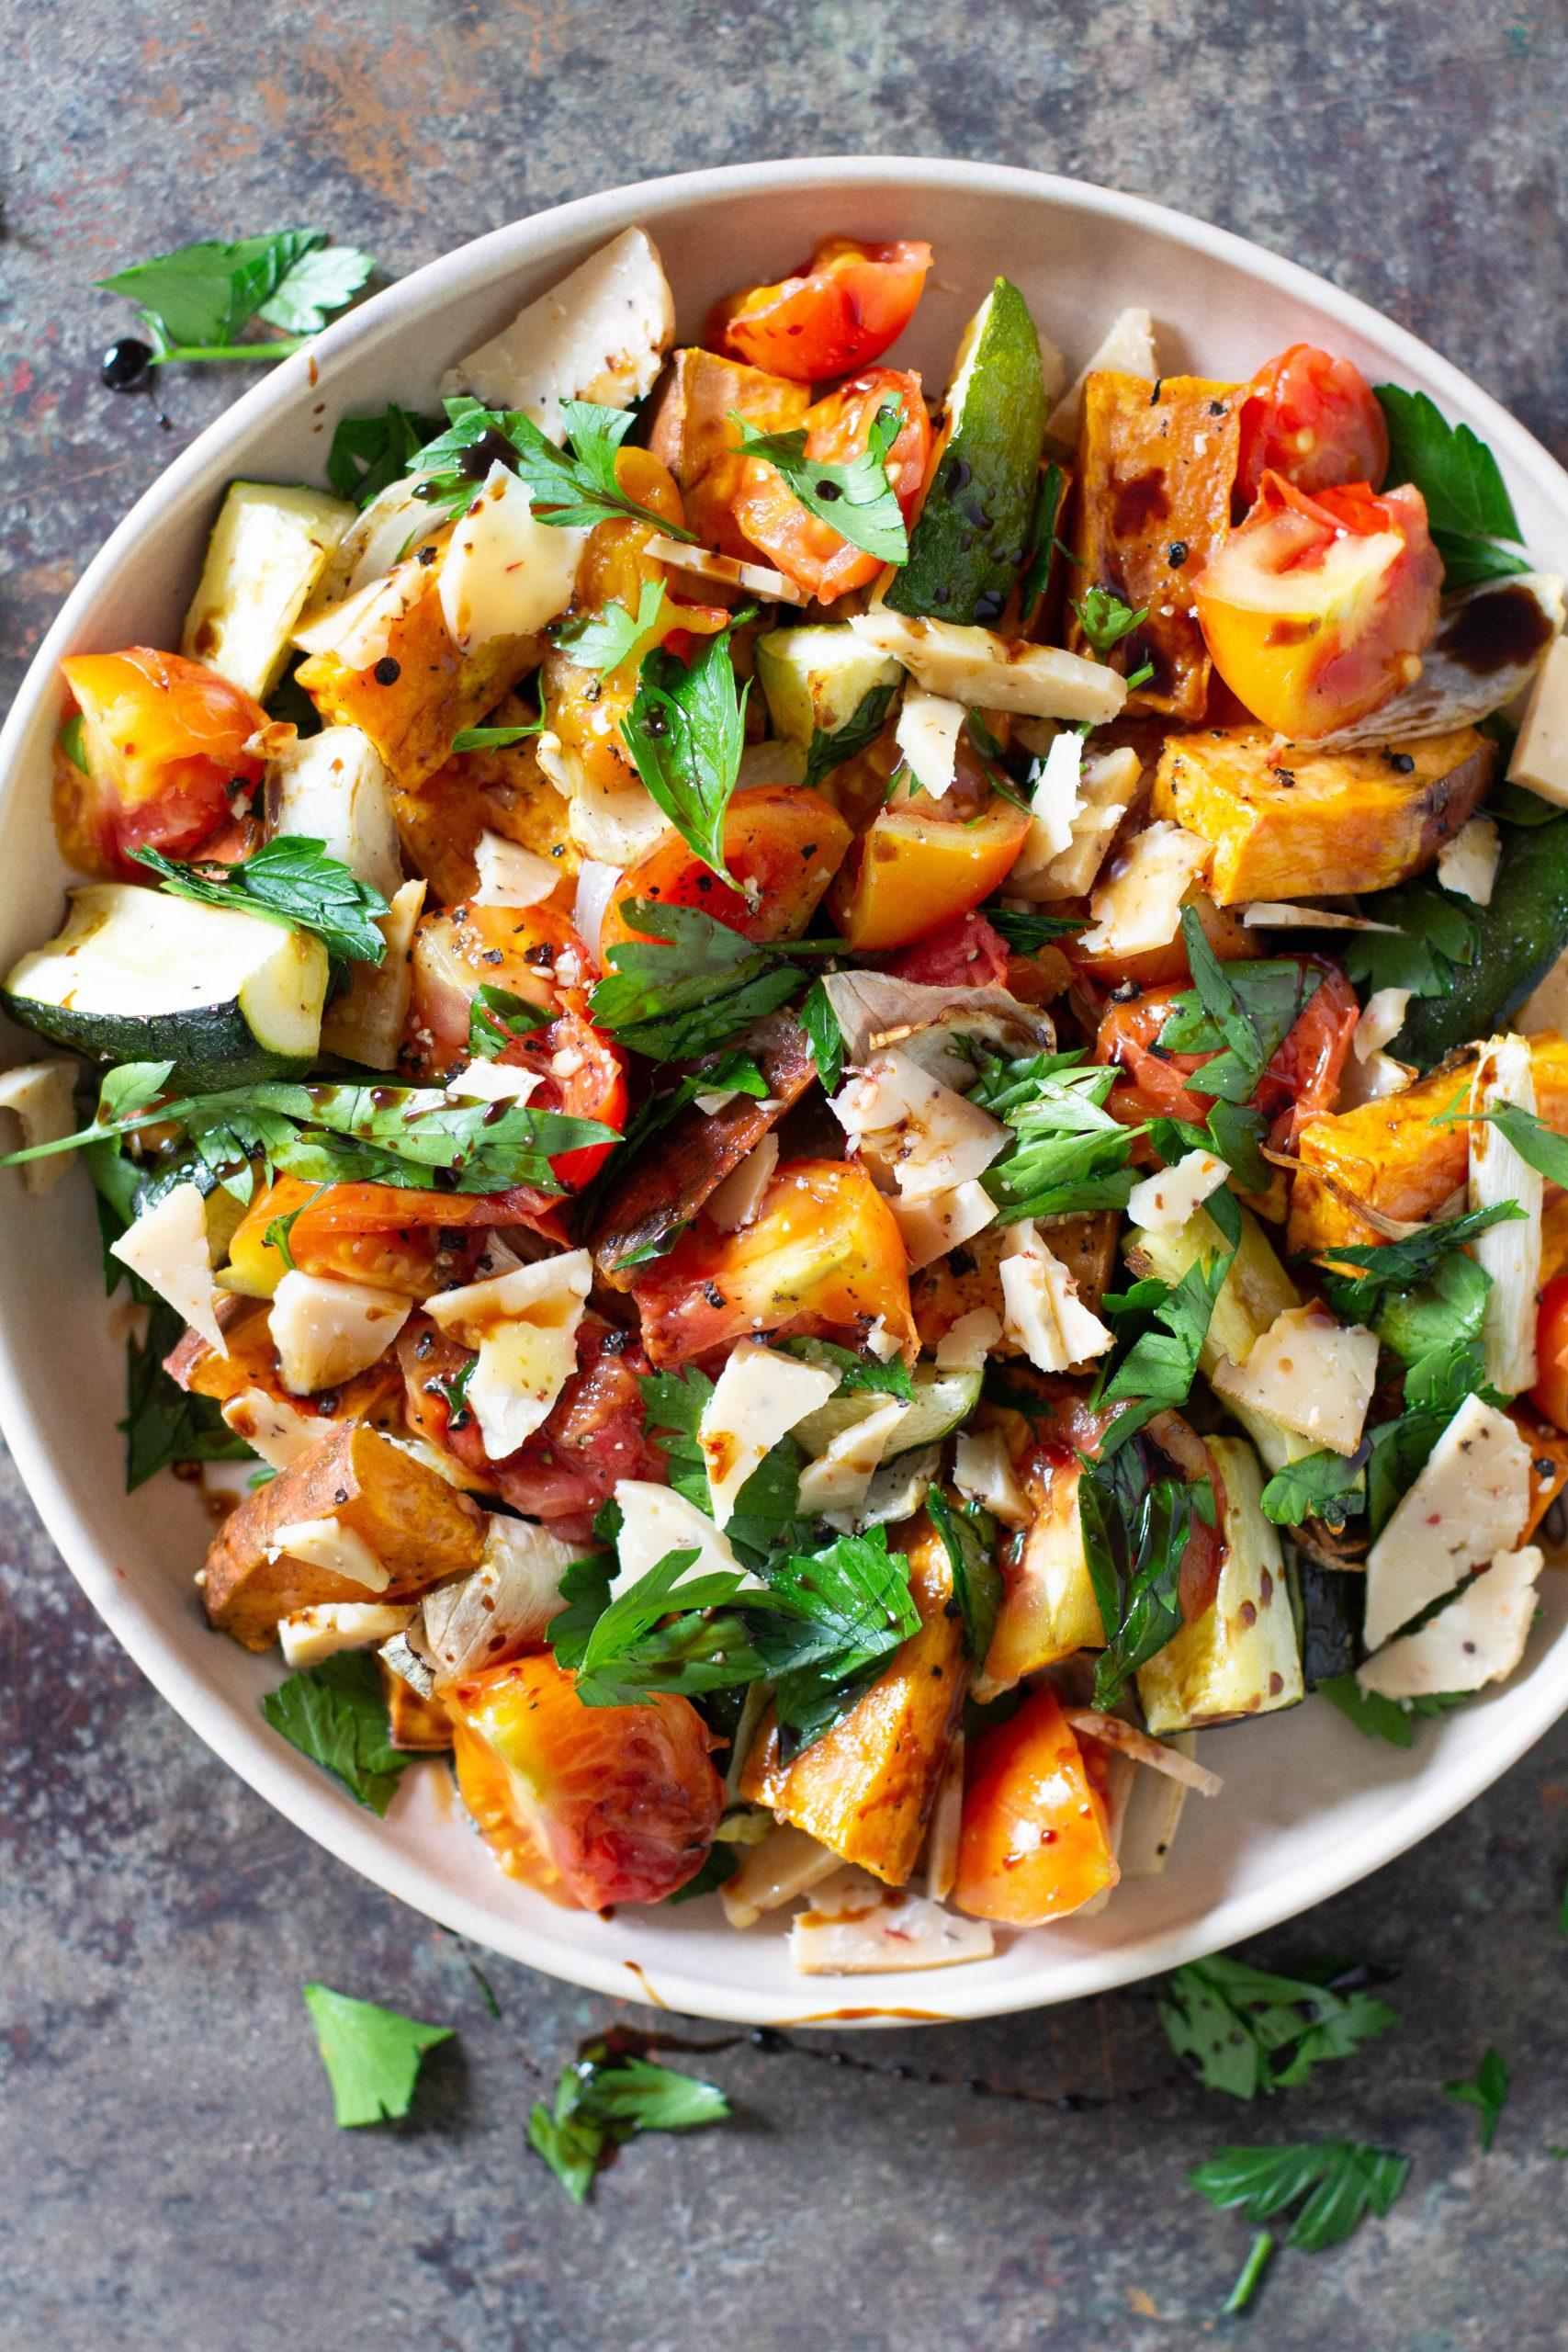 Sweet Potato, Zucchini & Tomato Salad with Balsamic Dressing